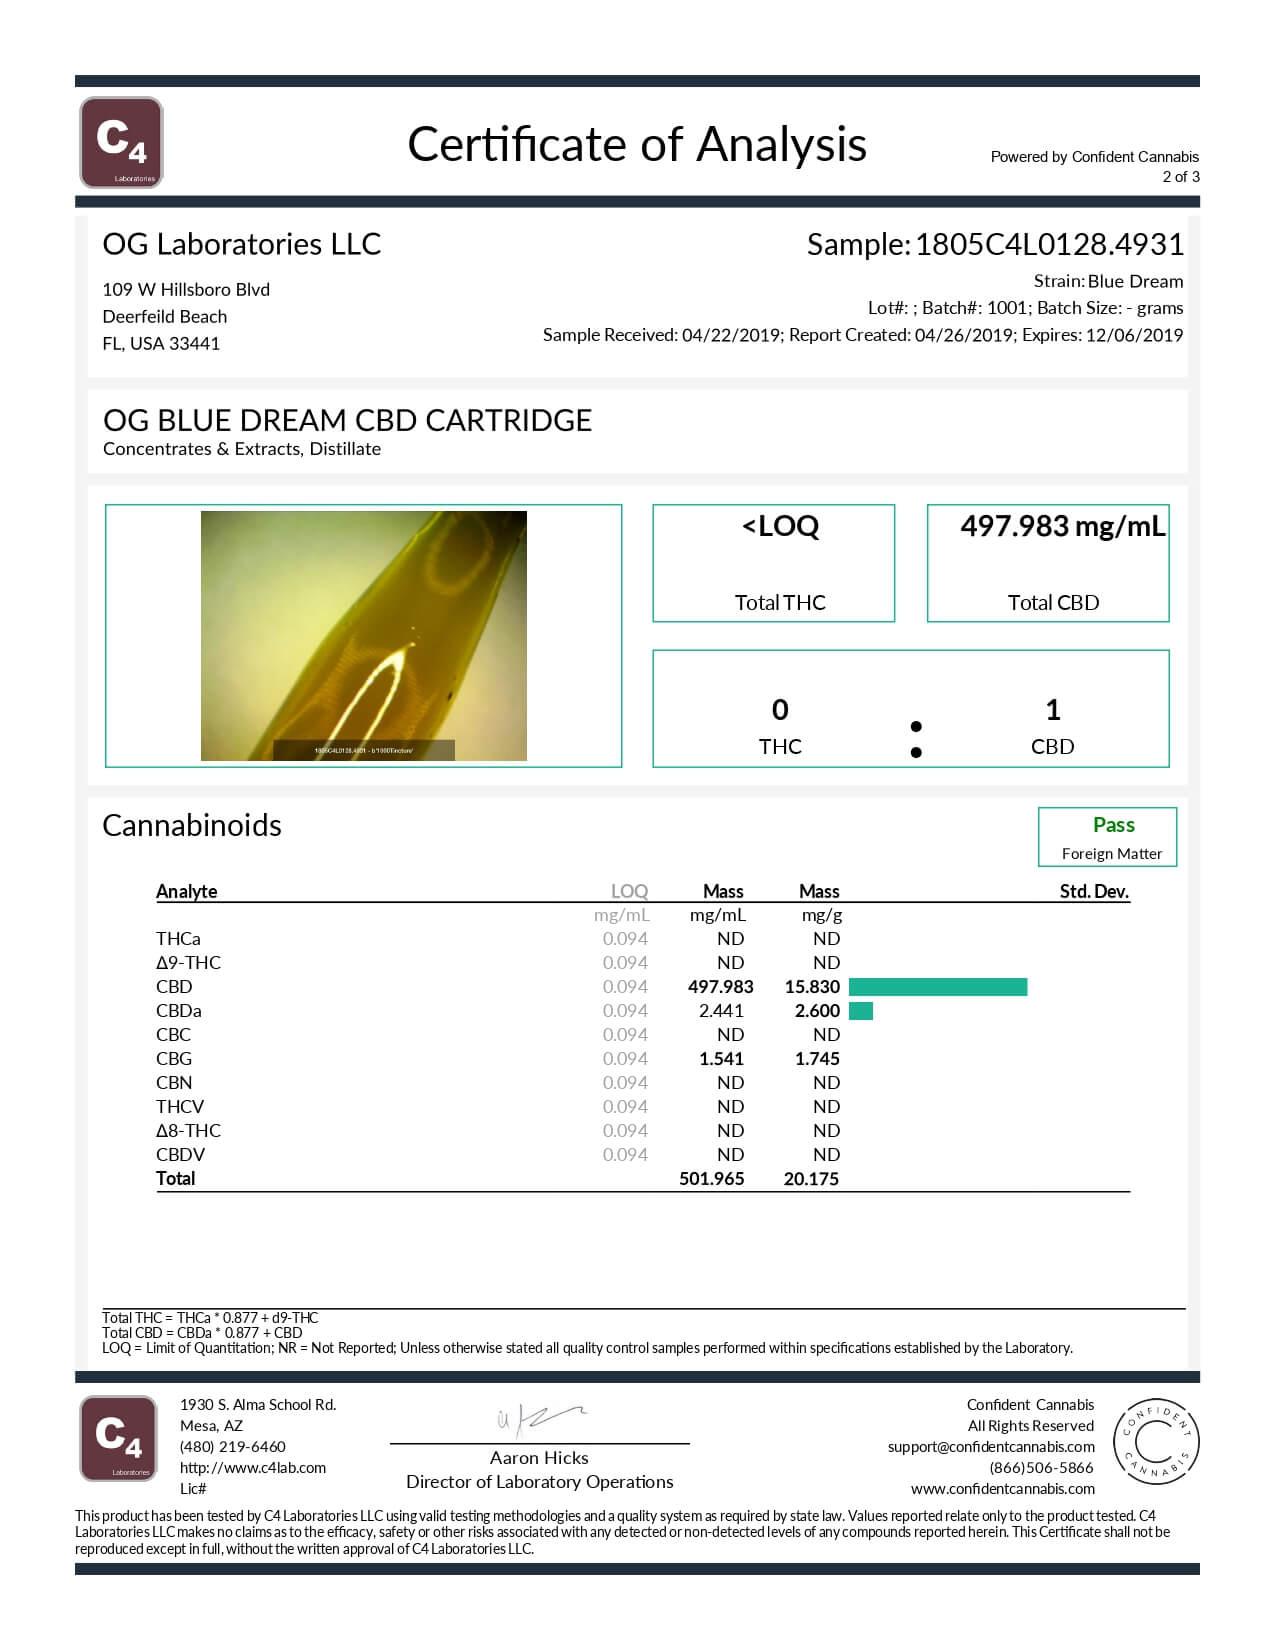 OG Labs CBD Cartridge Blue Dream Lab Report